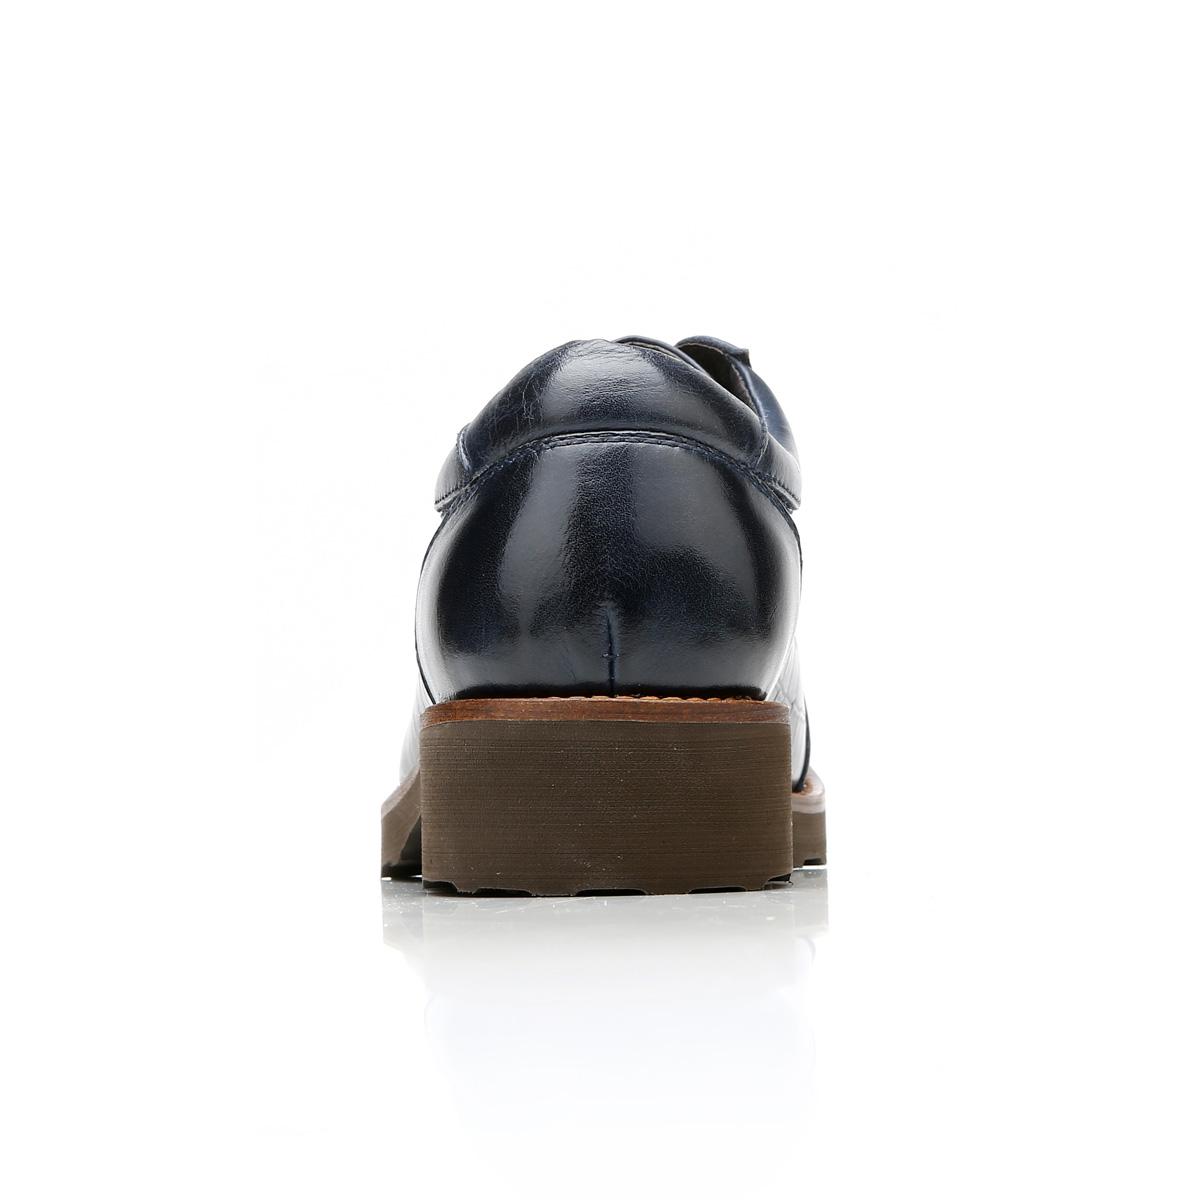 Giày da nam Olunpo QZK1405 vân cá sấu